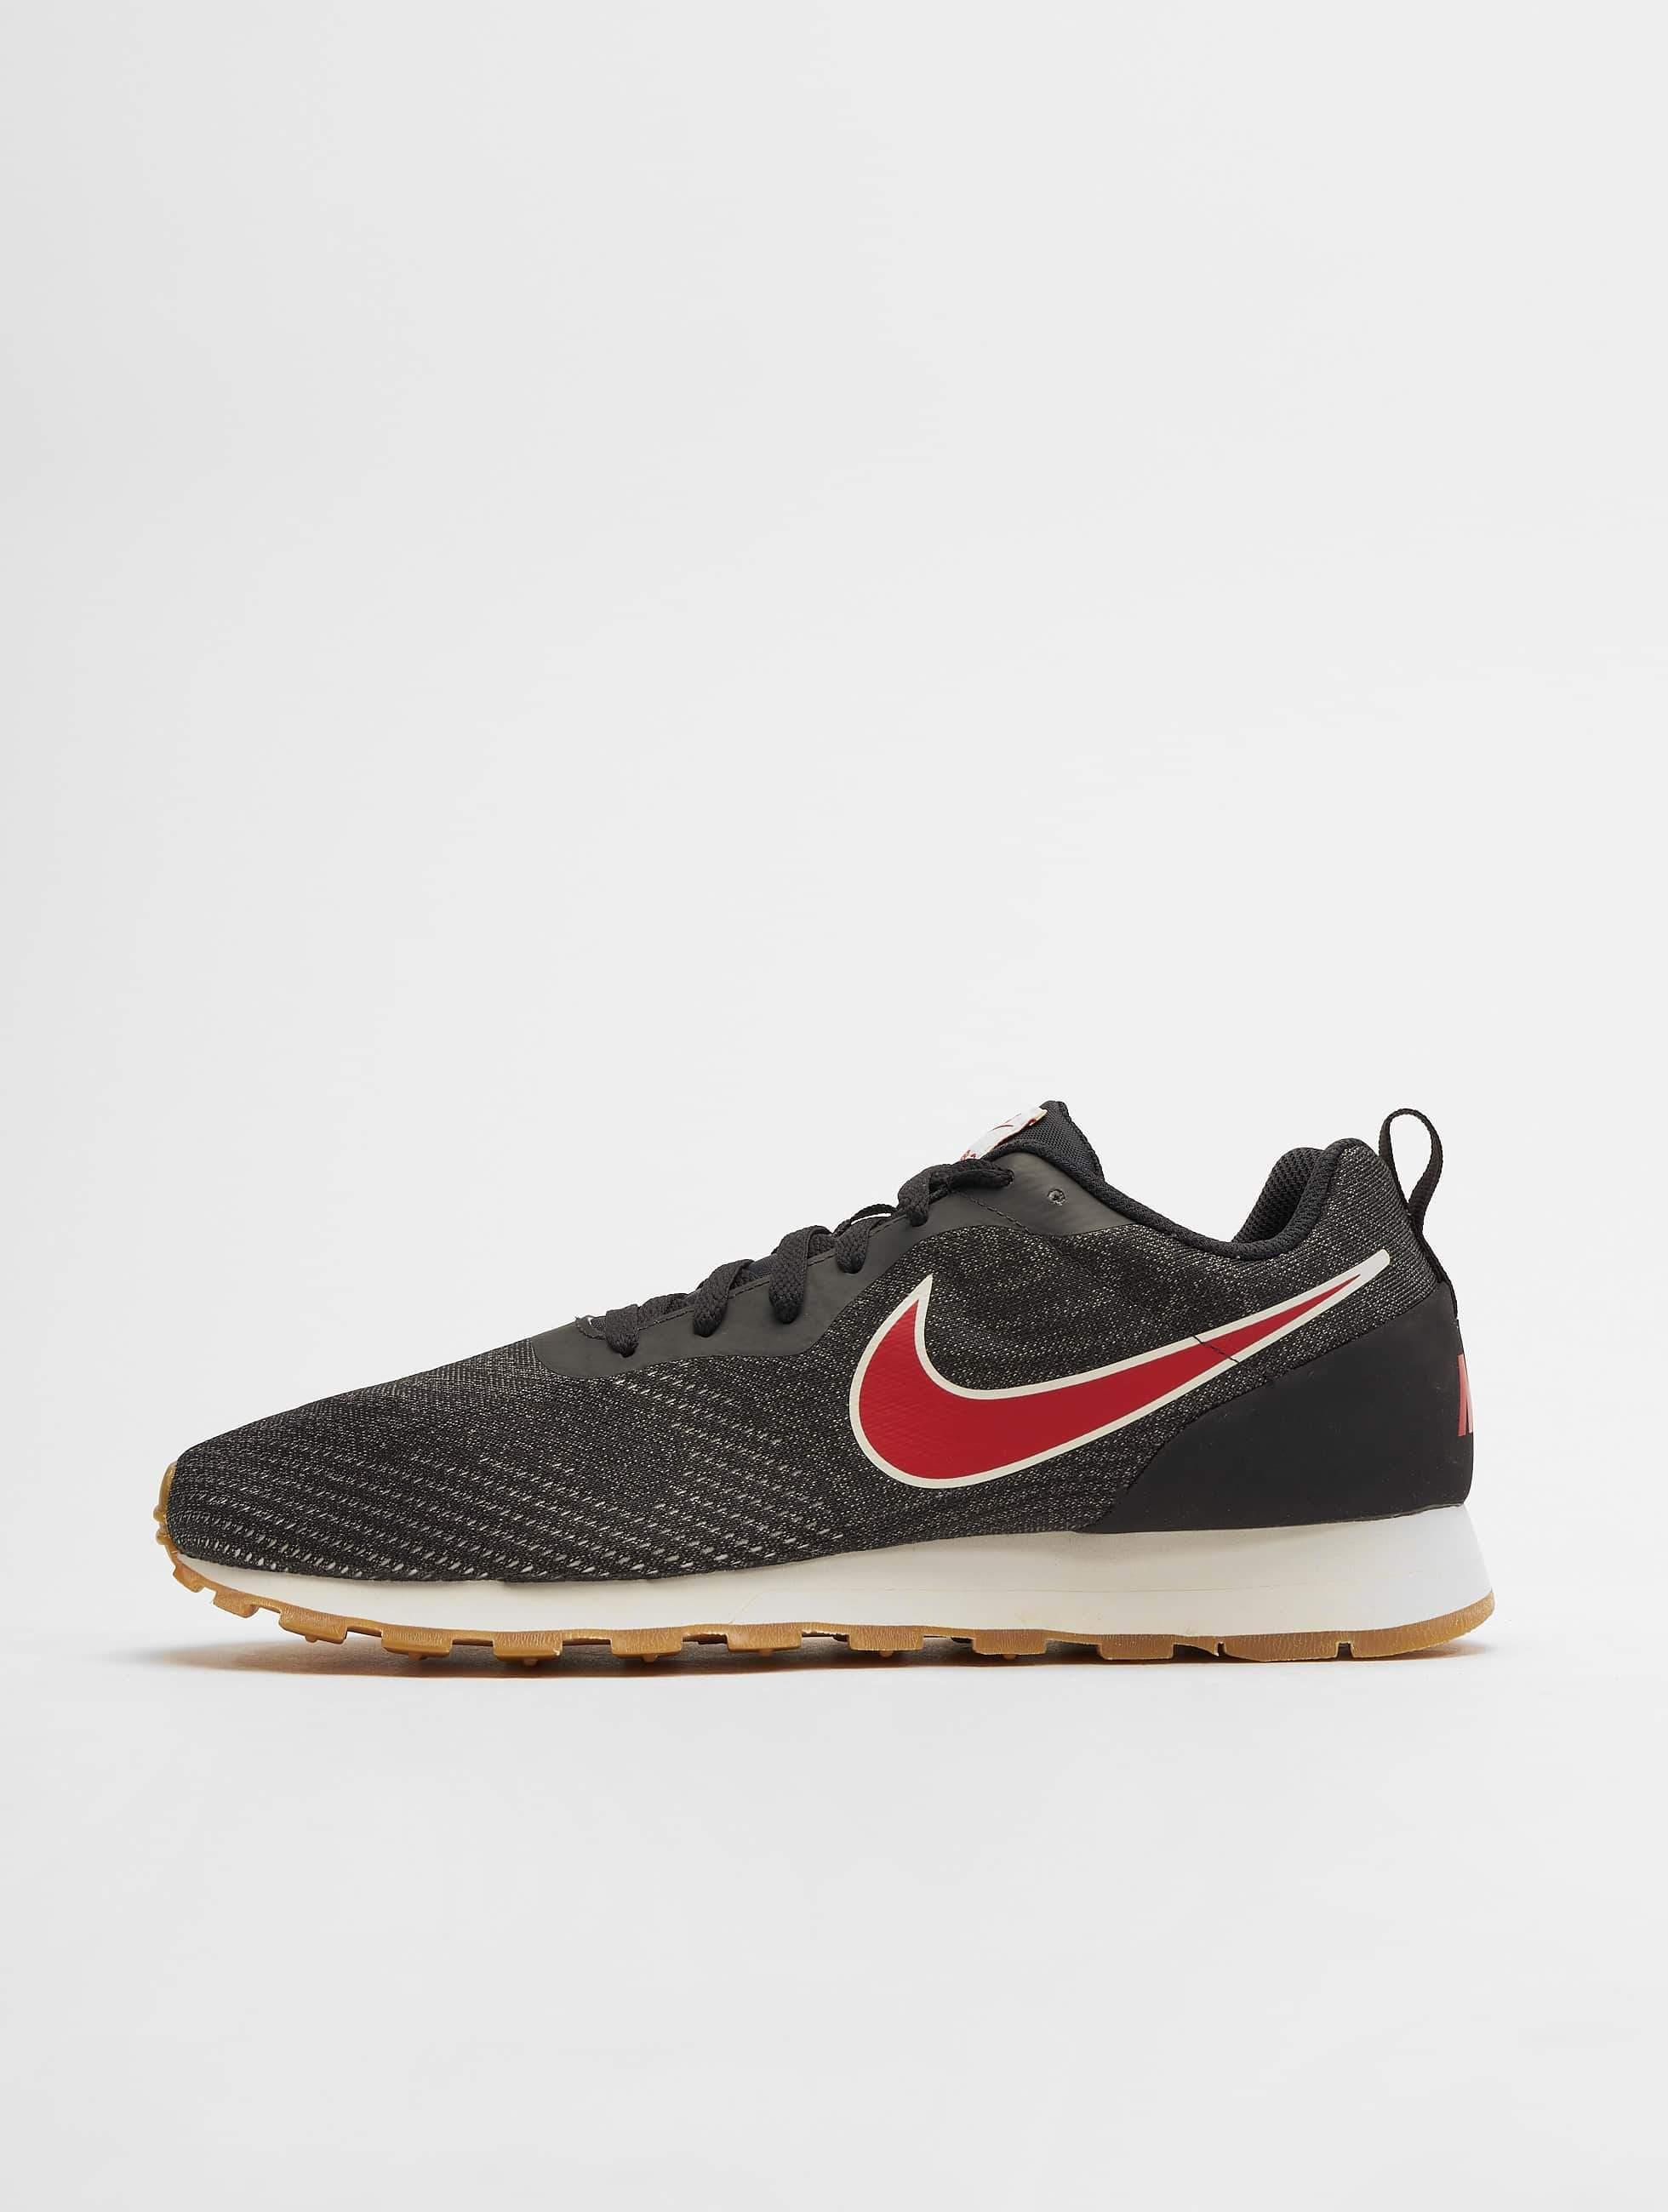 18c62950102 Nike schoen / sneaker Md Runner 2 in grijs 536143